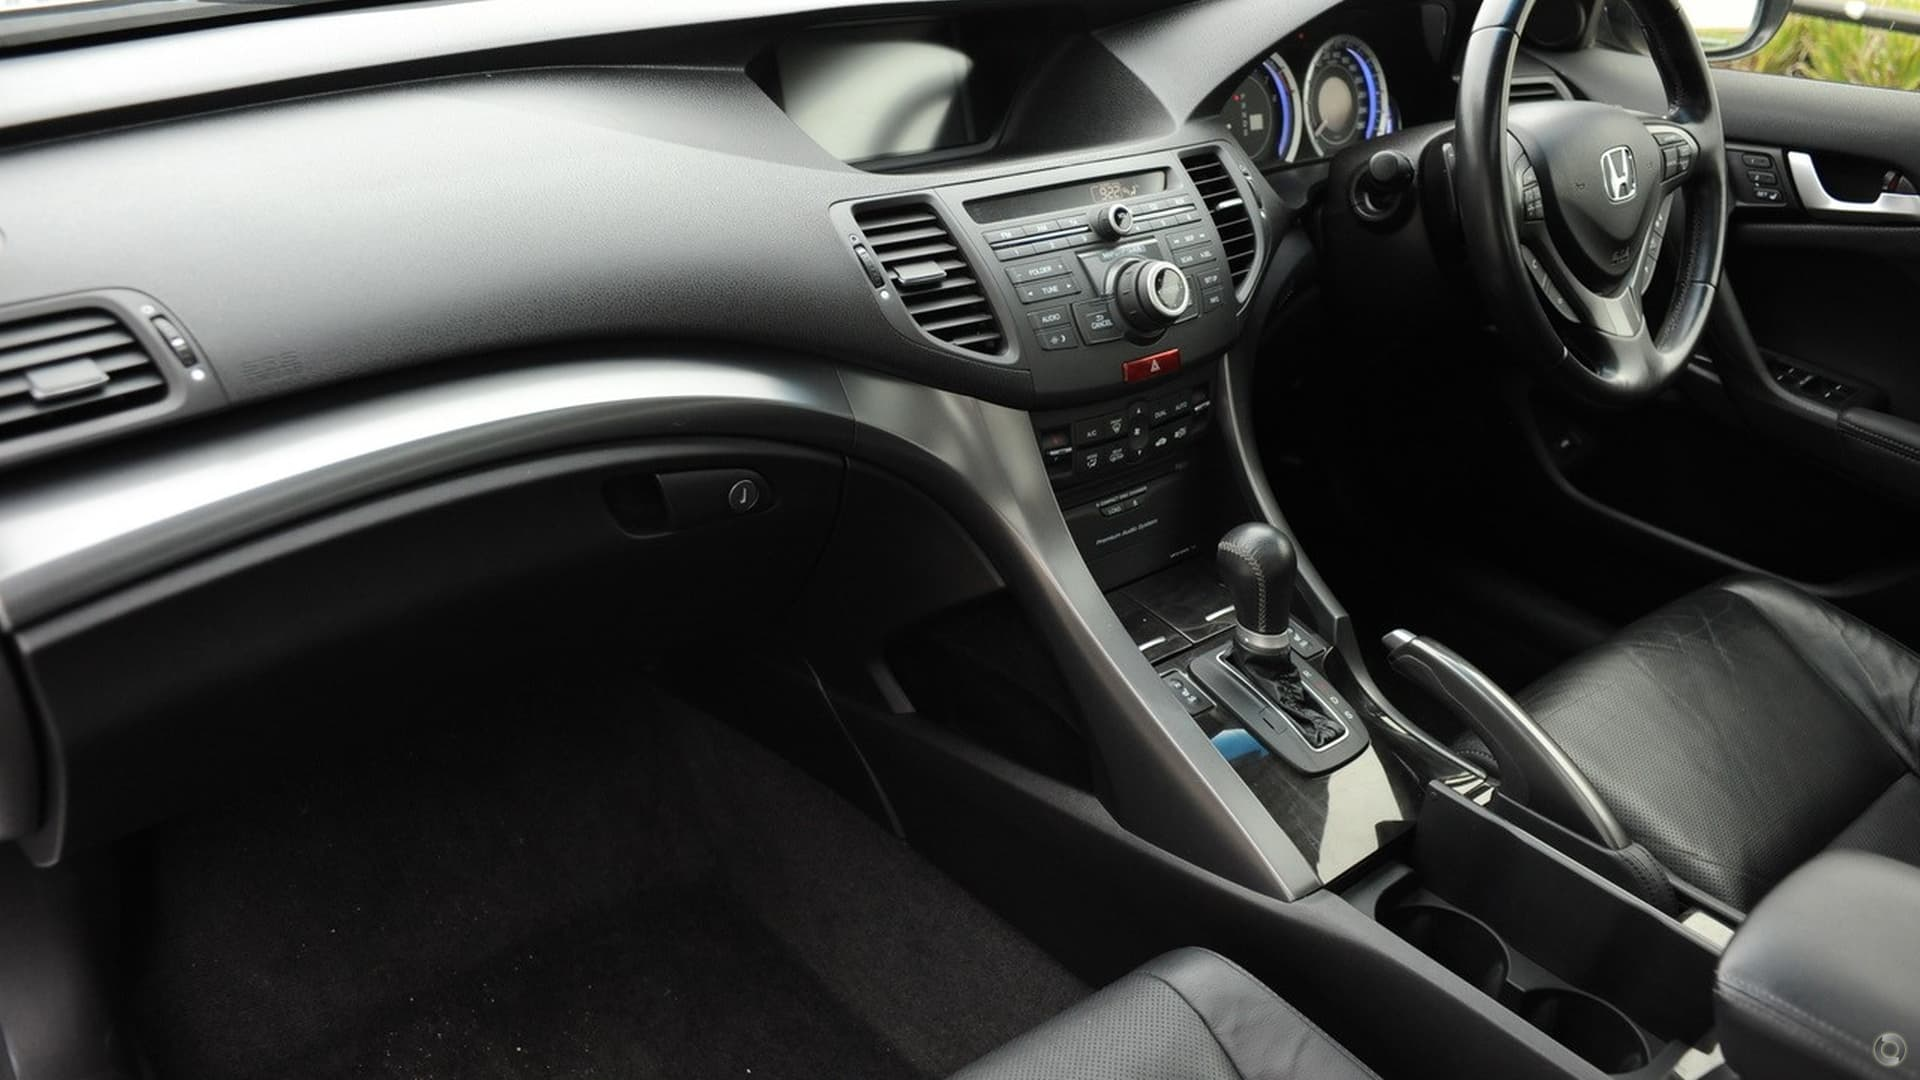 2008 Honda Accord Euro Luxury Navi 8th Gen